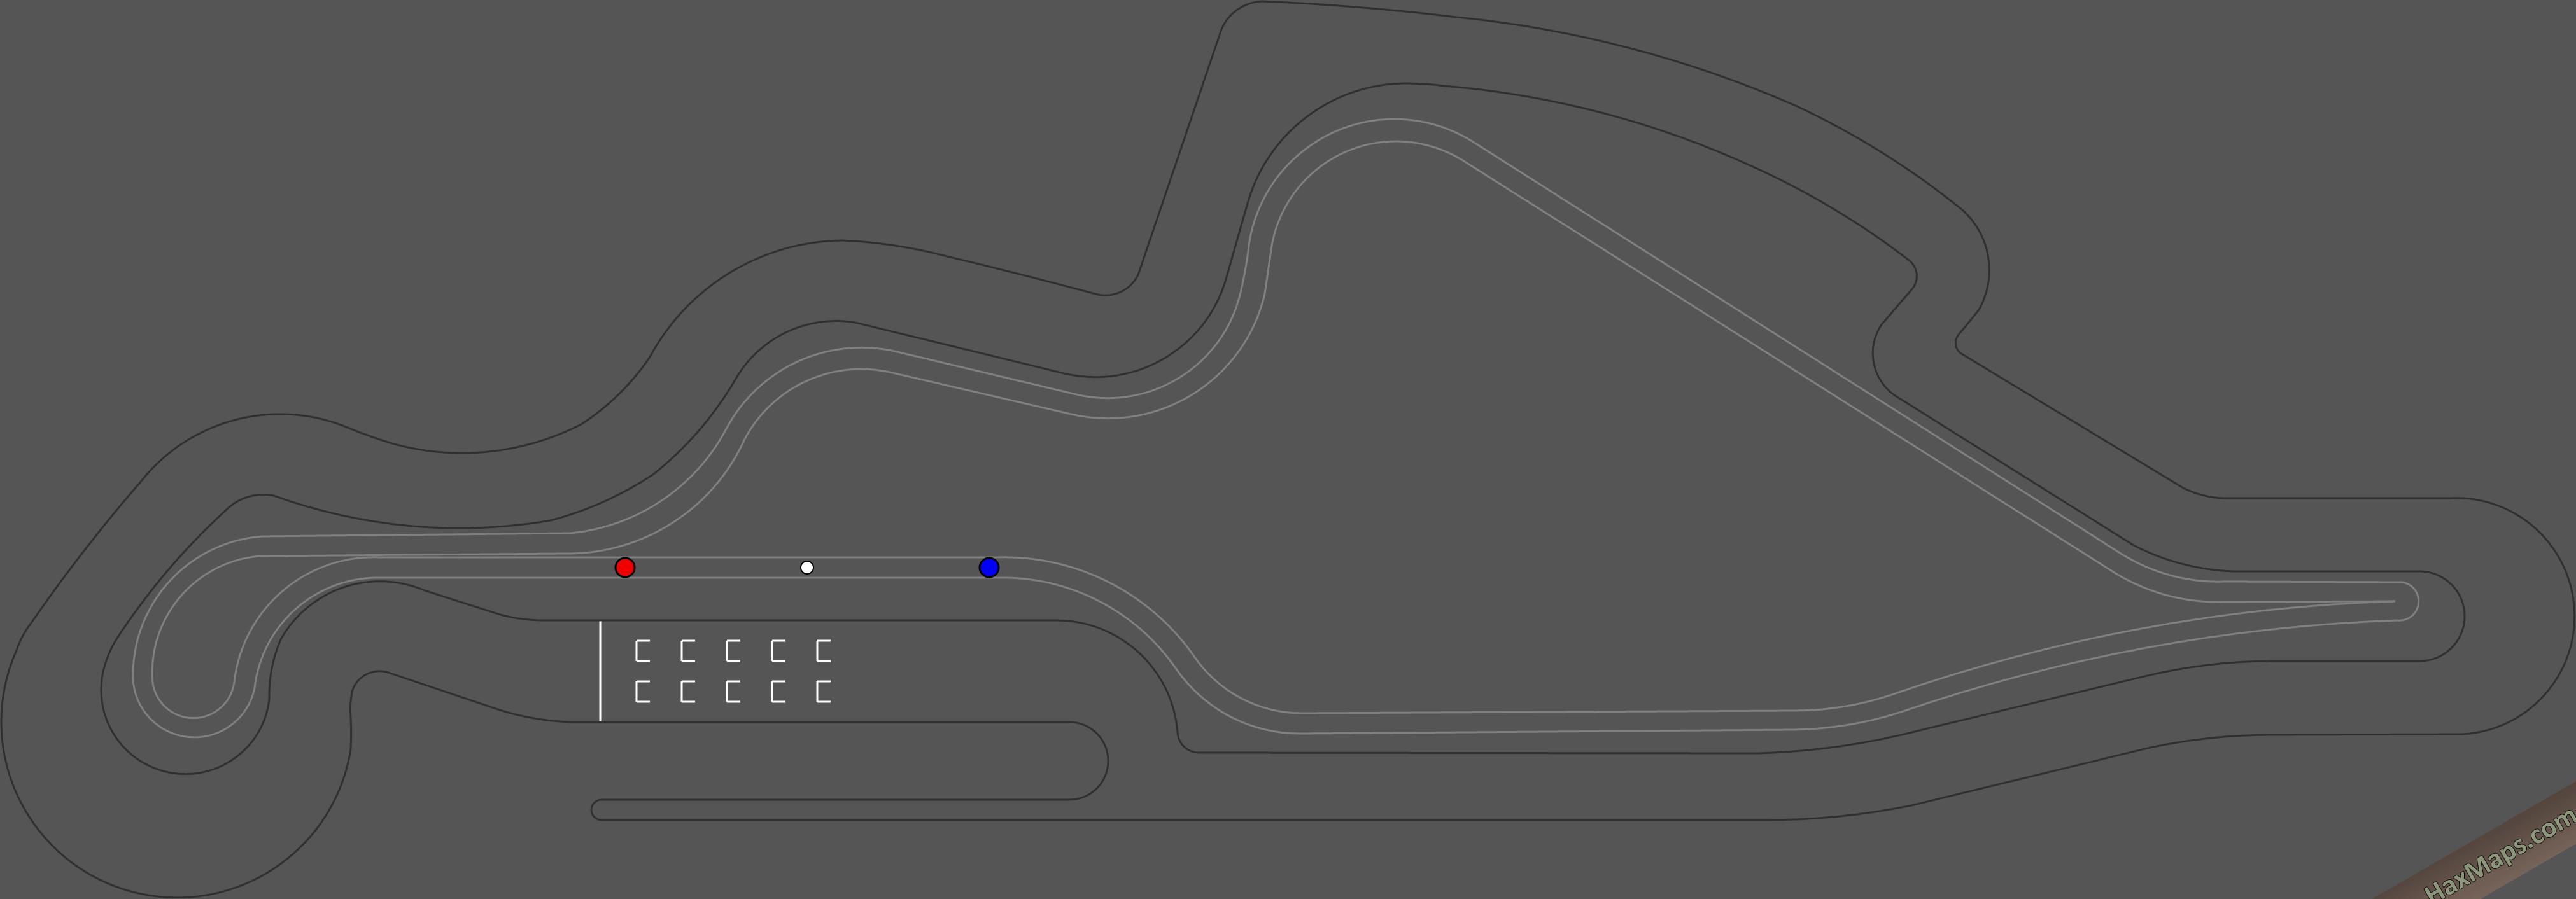 hax ball maps   Canada F1 Circuit Gilles Villeneuve by POPkORN